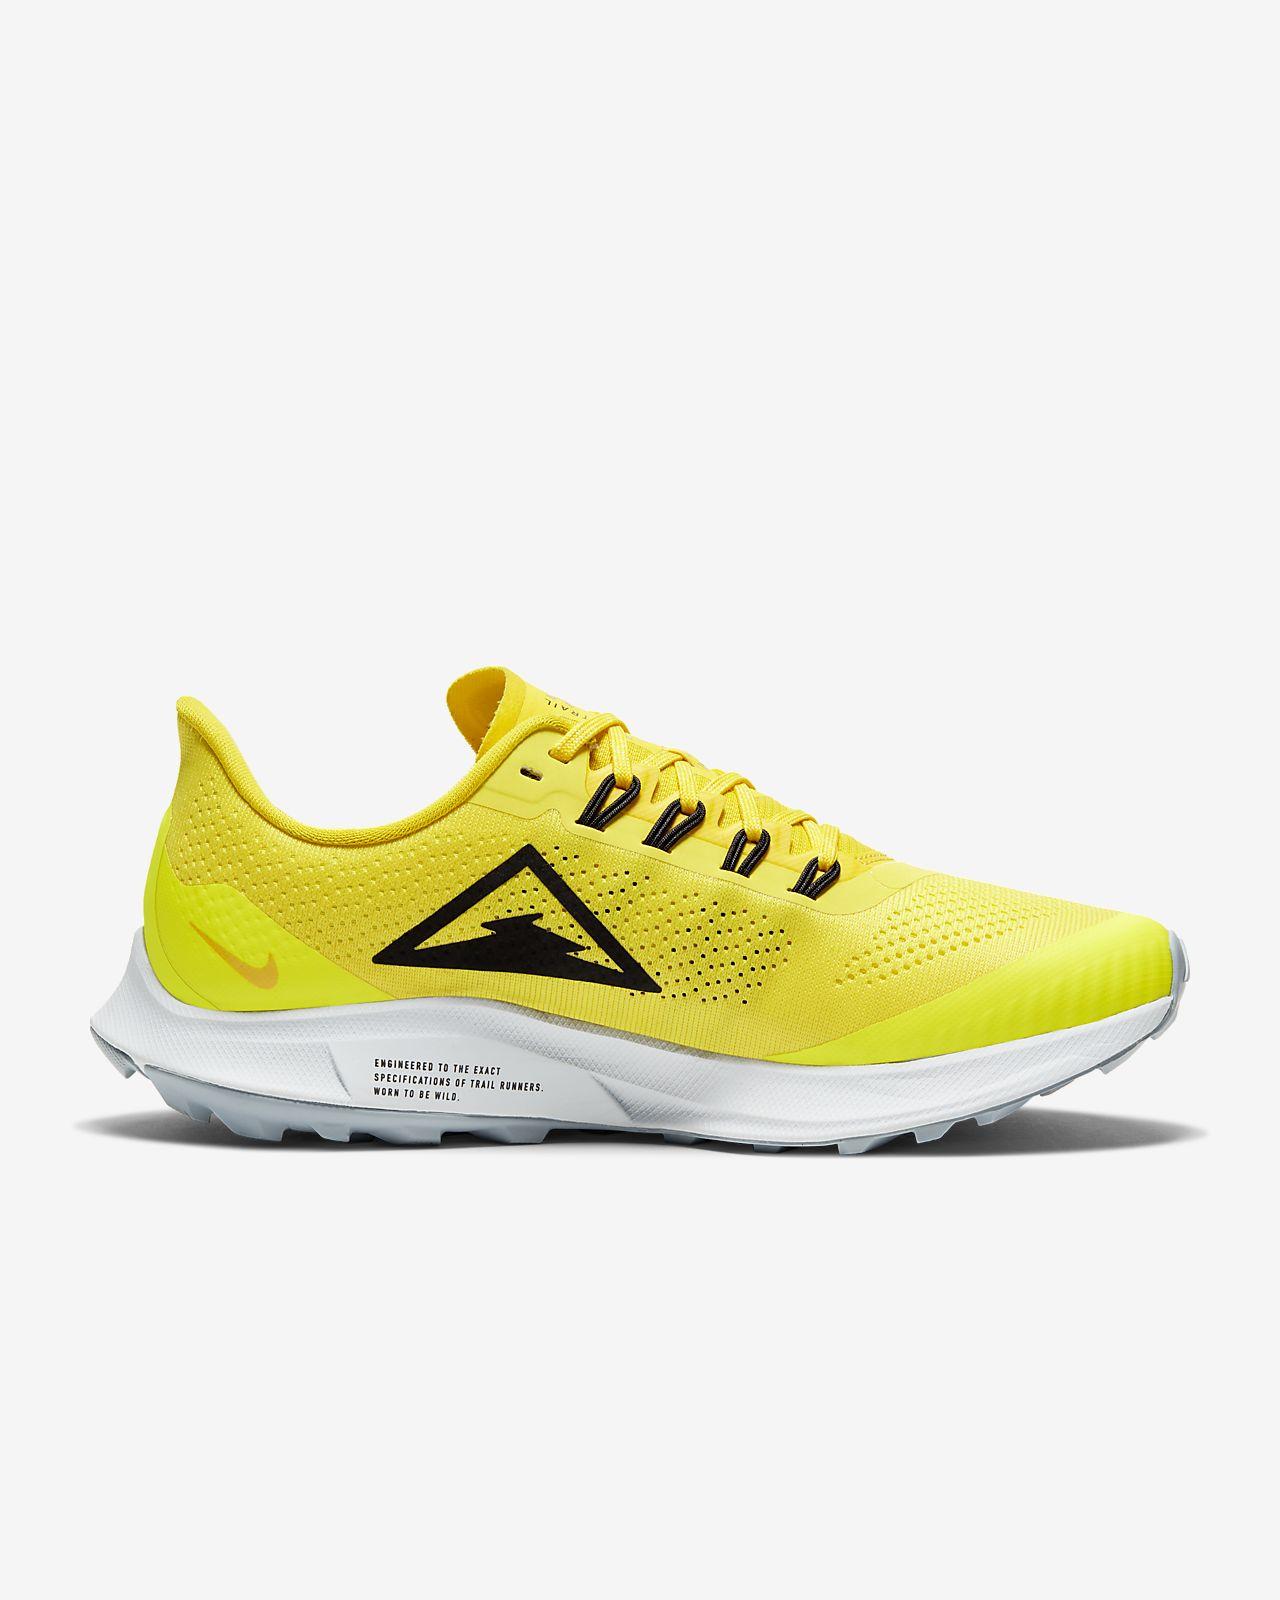 7 Reasons toNOT to Buy Nike Wild Trail (Mar 2020) | RunRepeat